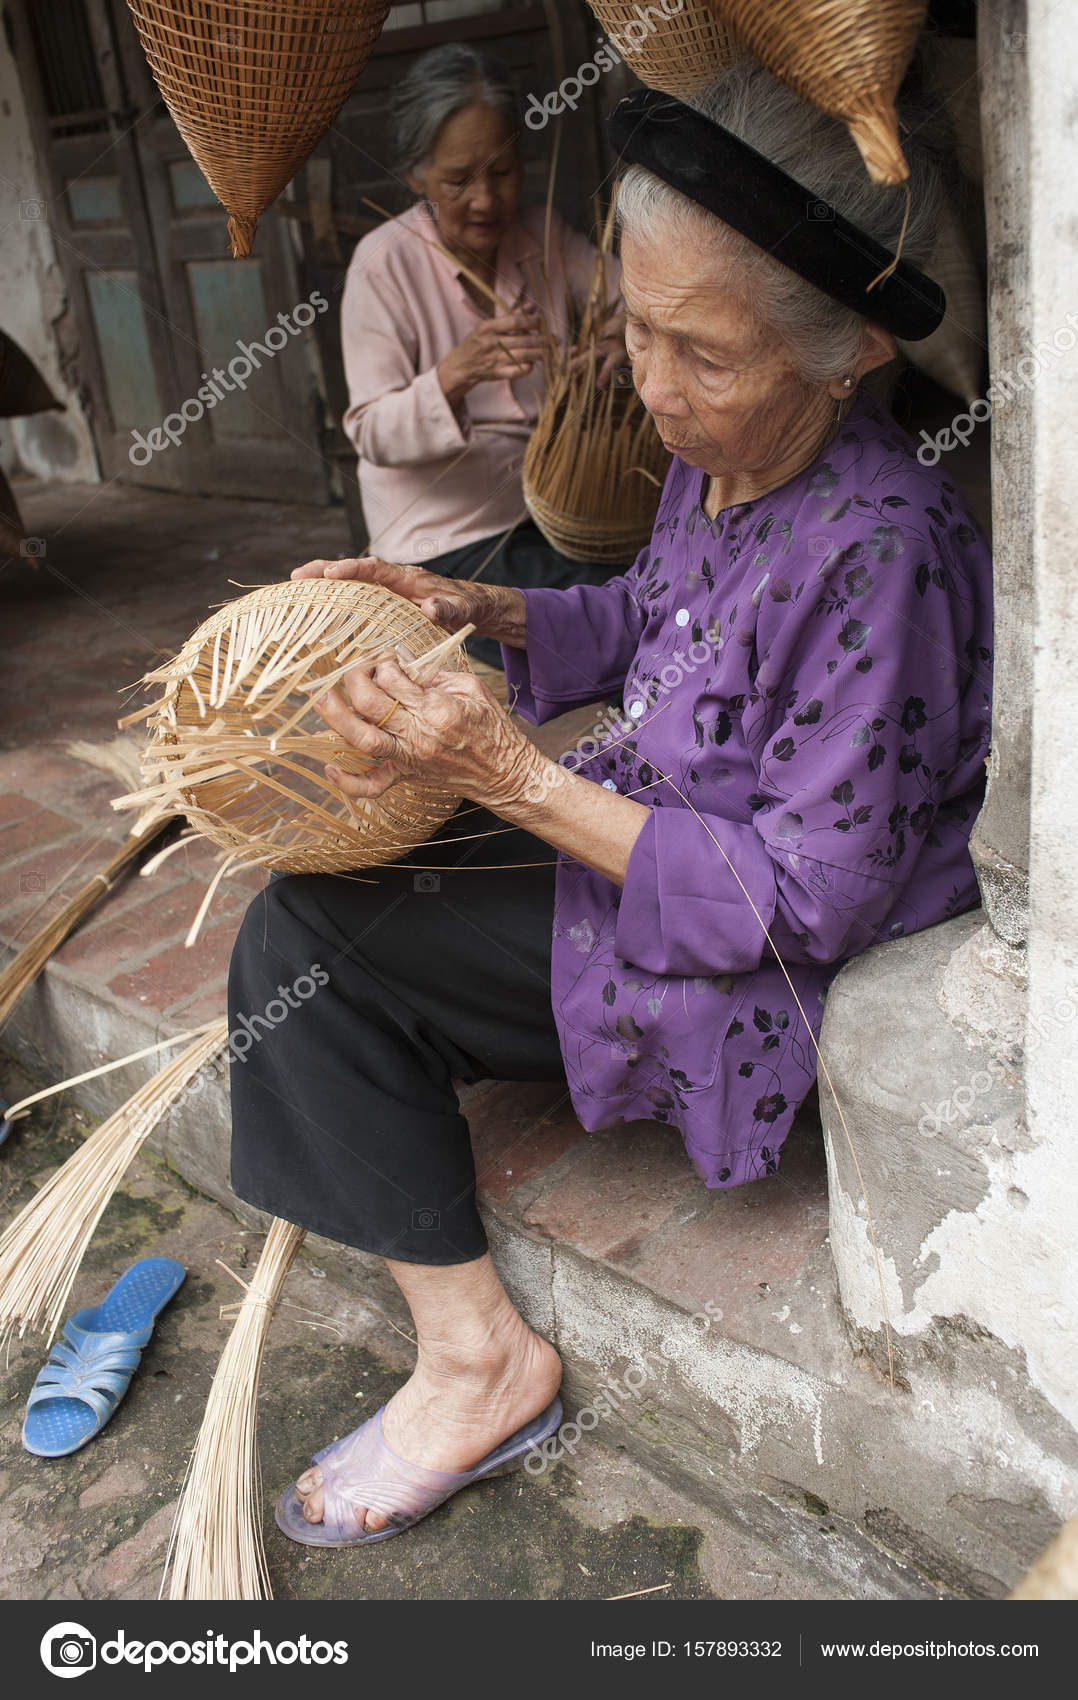 f6ec45abc6aa Βιετναμέζικα-masters καθιστώντας Μπαμπού χειροτεχνίας προϊόντα για τη  διατήρηση μιας παραδοσιακής χειροτεχνίας σε ένα τοπίο του Βιετνάμ. Έννοια  της ζωής στο ...